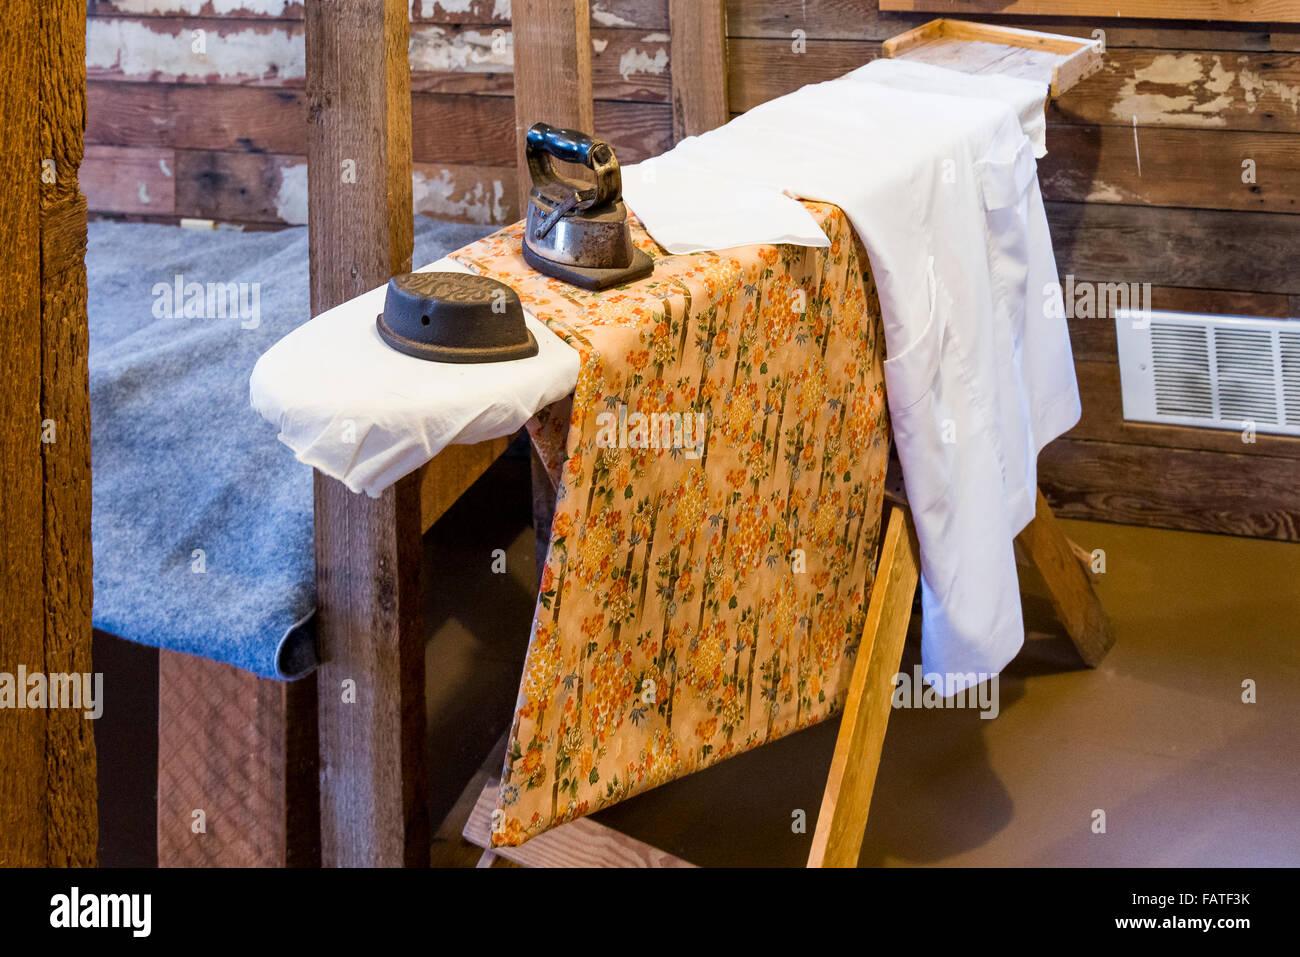 Ironing board insidet a house at Britannia Shipyards, National Historic Site, Steveston, Richmond, British Columbia, - Stock Image